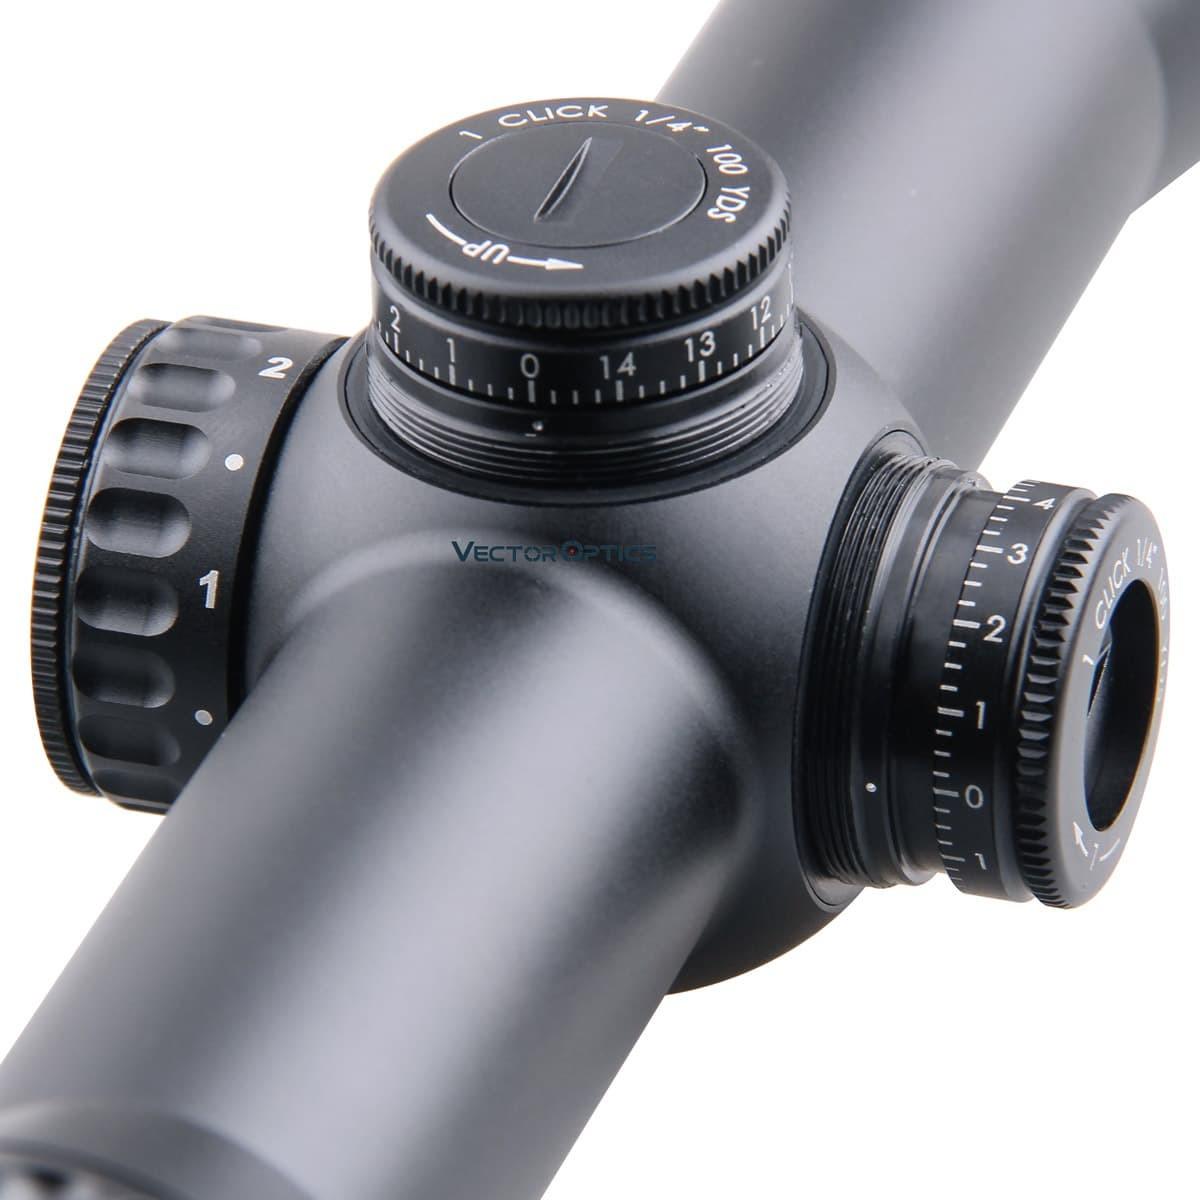 Continental 1.5-9x42SFP Riflescope